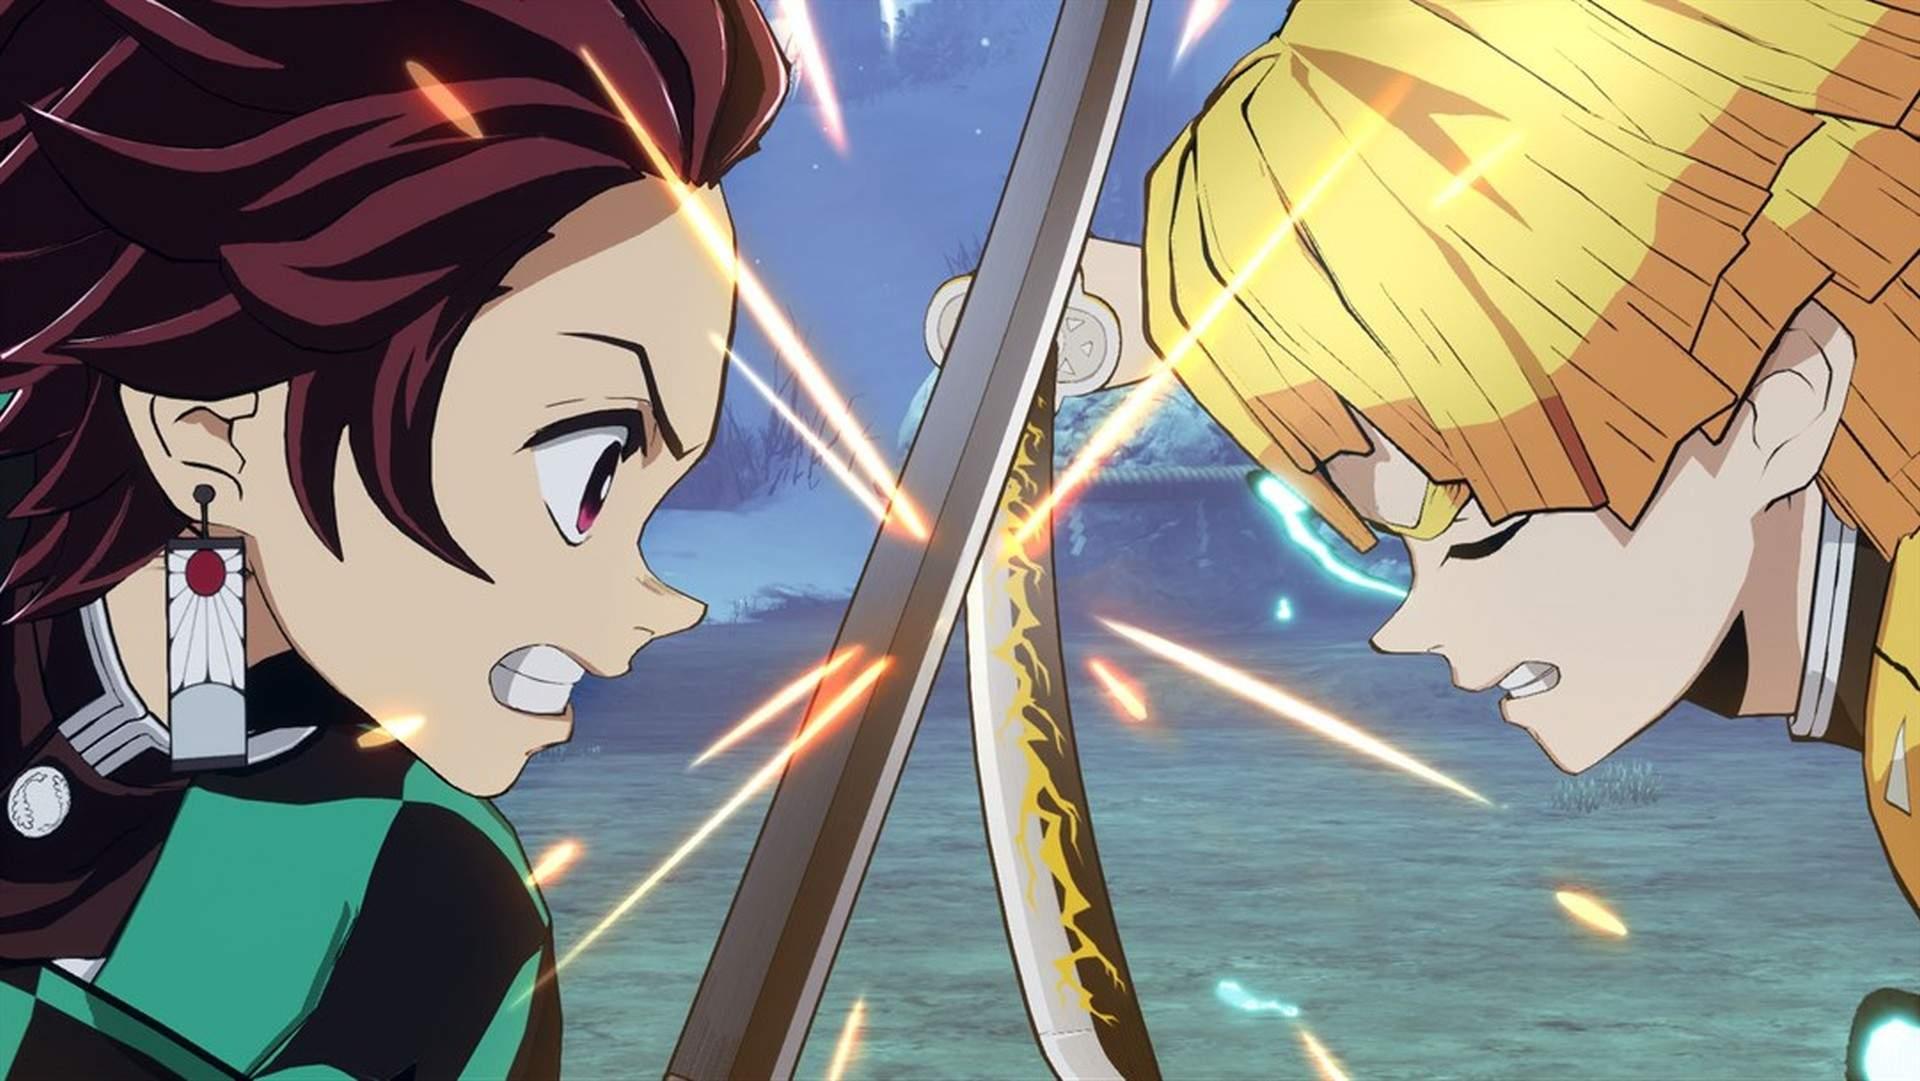 Demon Slayer -Kimetsu no Yaiba- The Hinokami Chronicles – October 15 – Optimized for Xbox Series X S